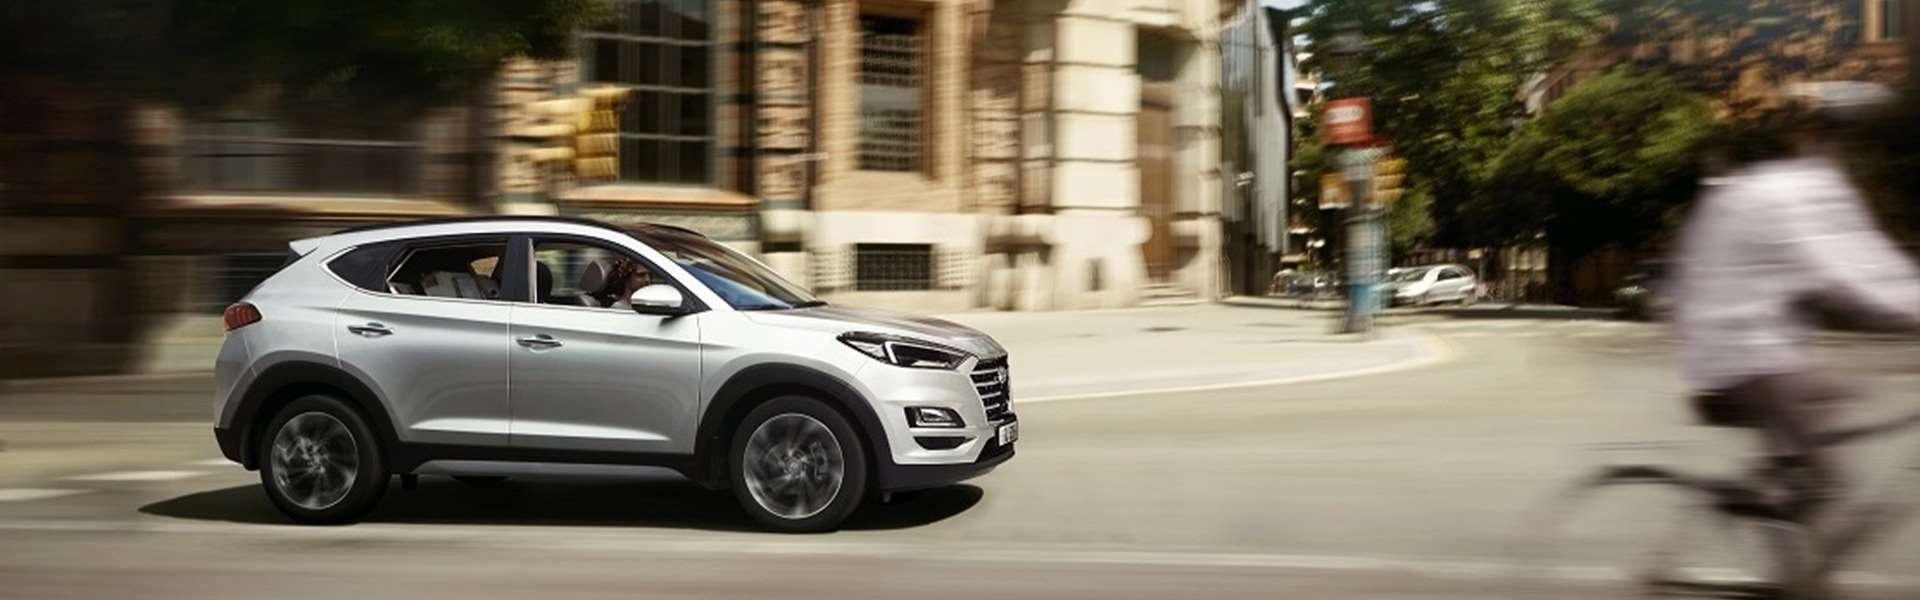 Hyundai Tucson готов к новым путешествиям